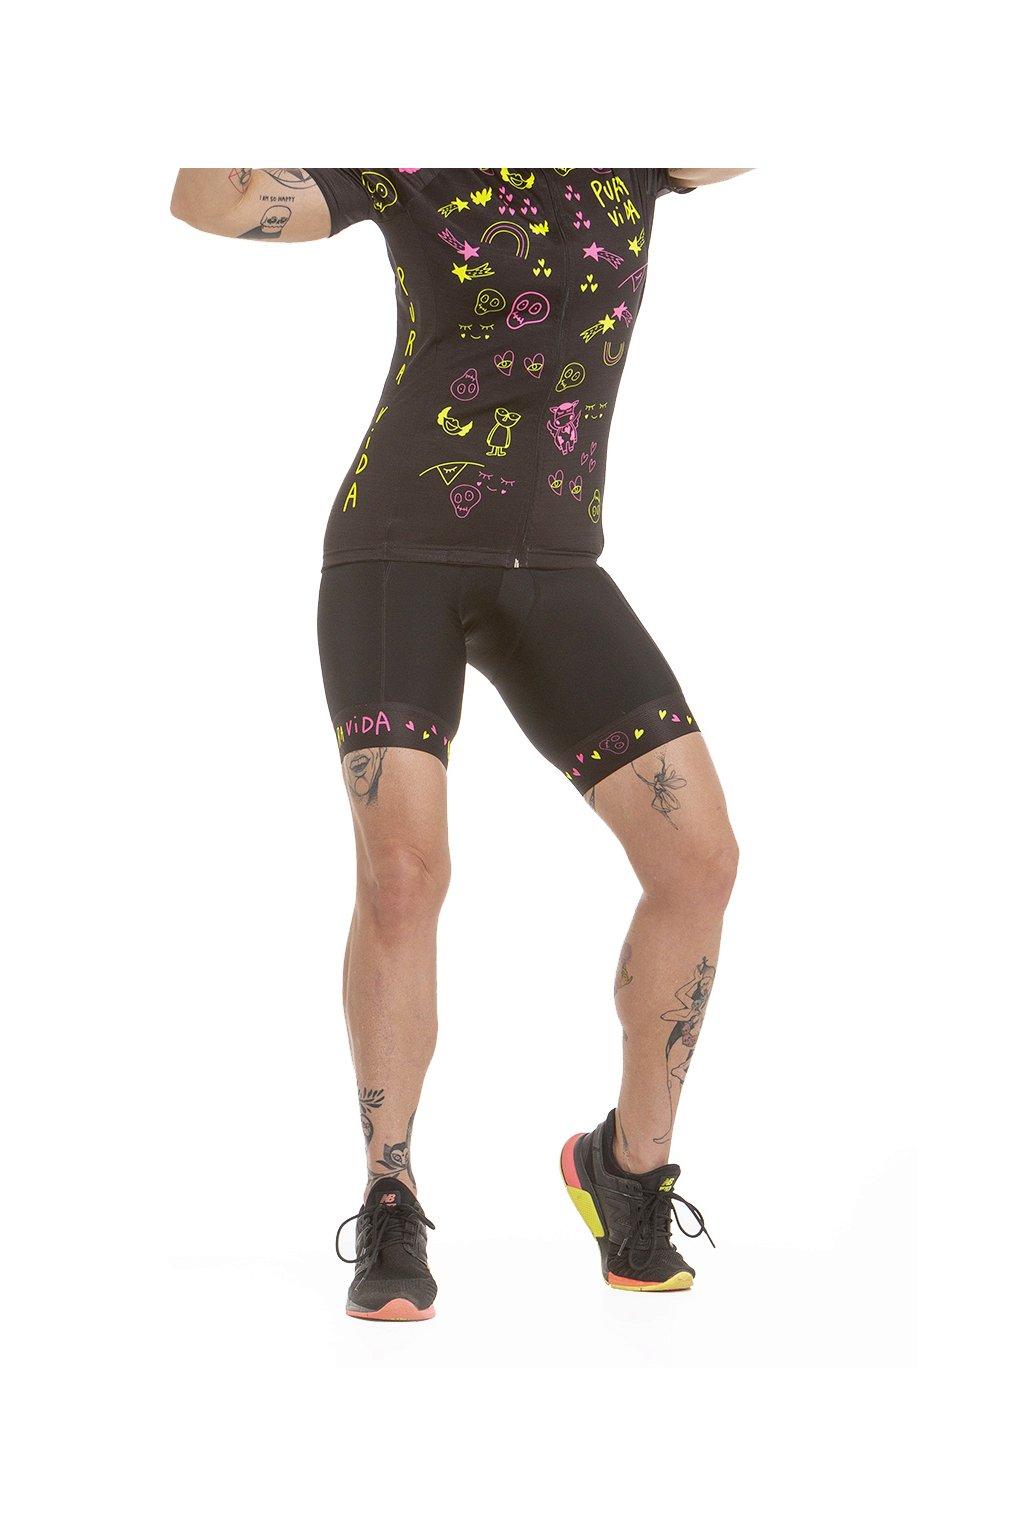 puravida cyklo antidepky spodni new 02